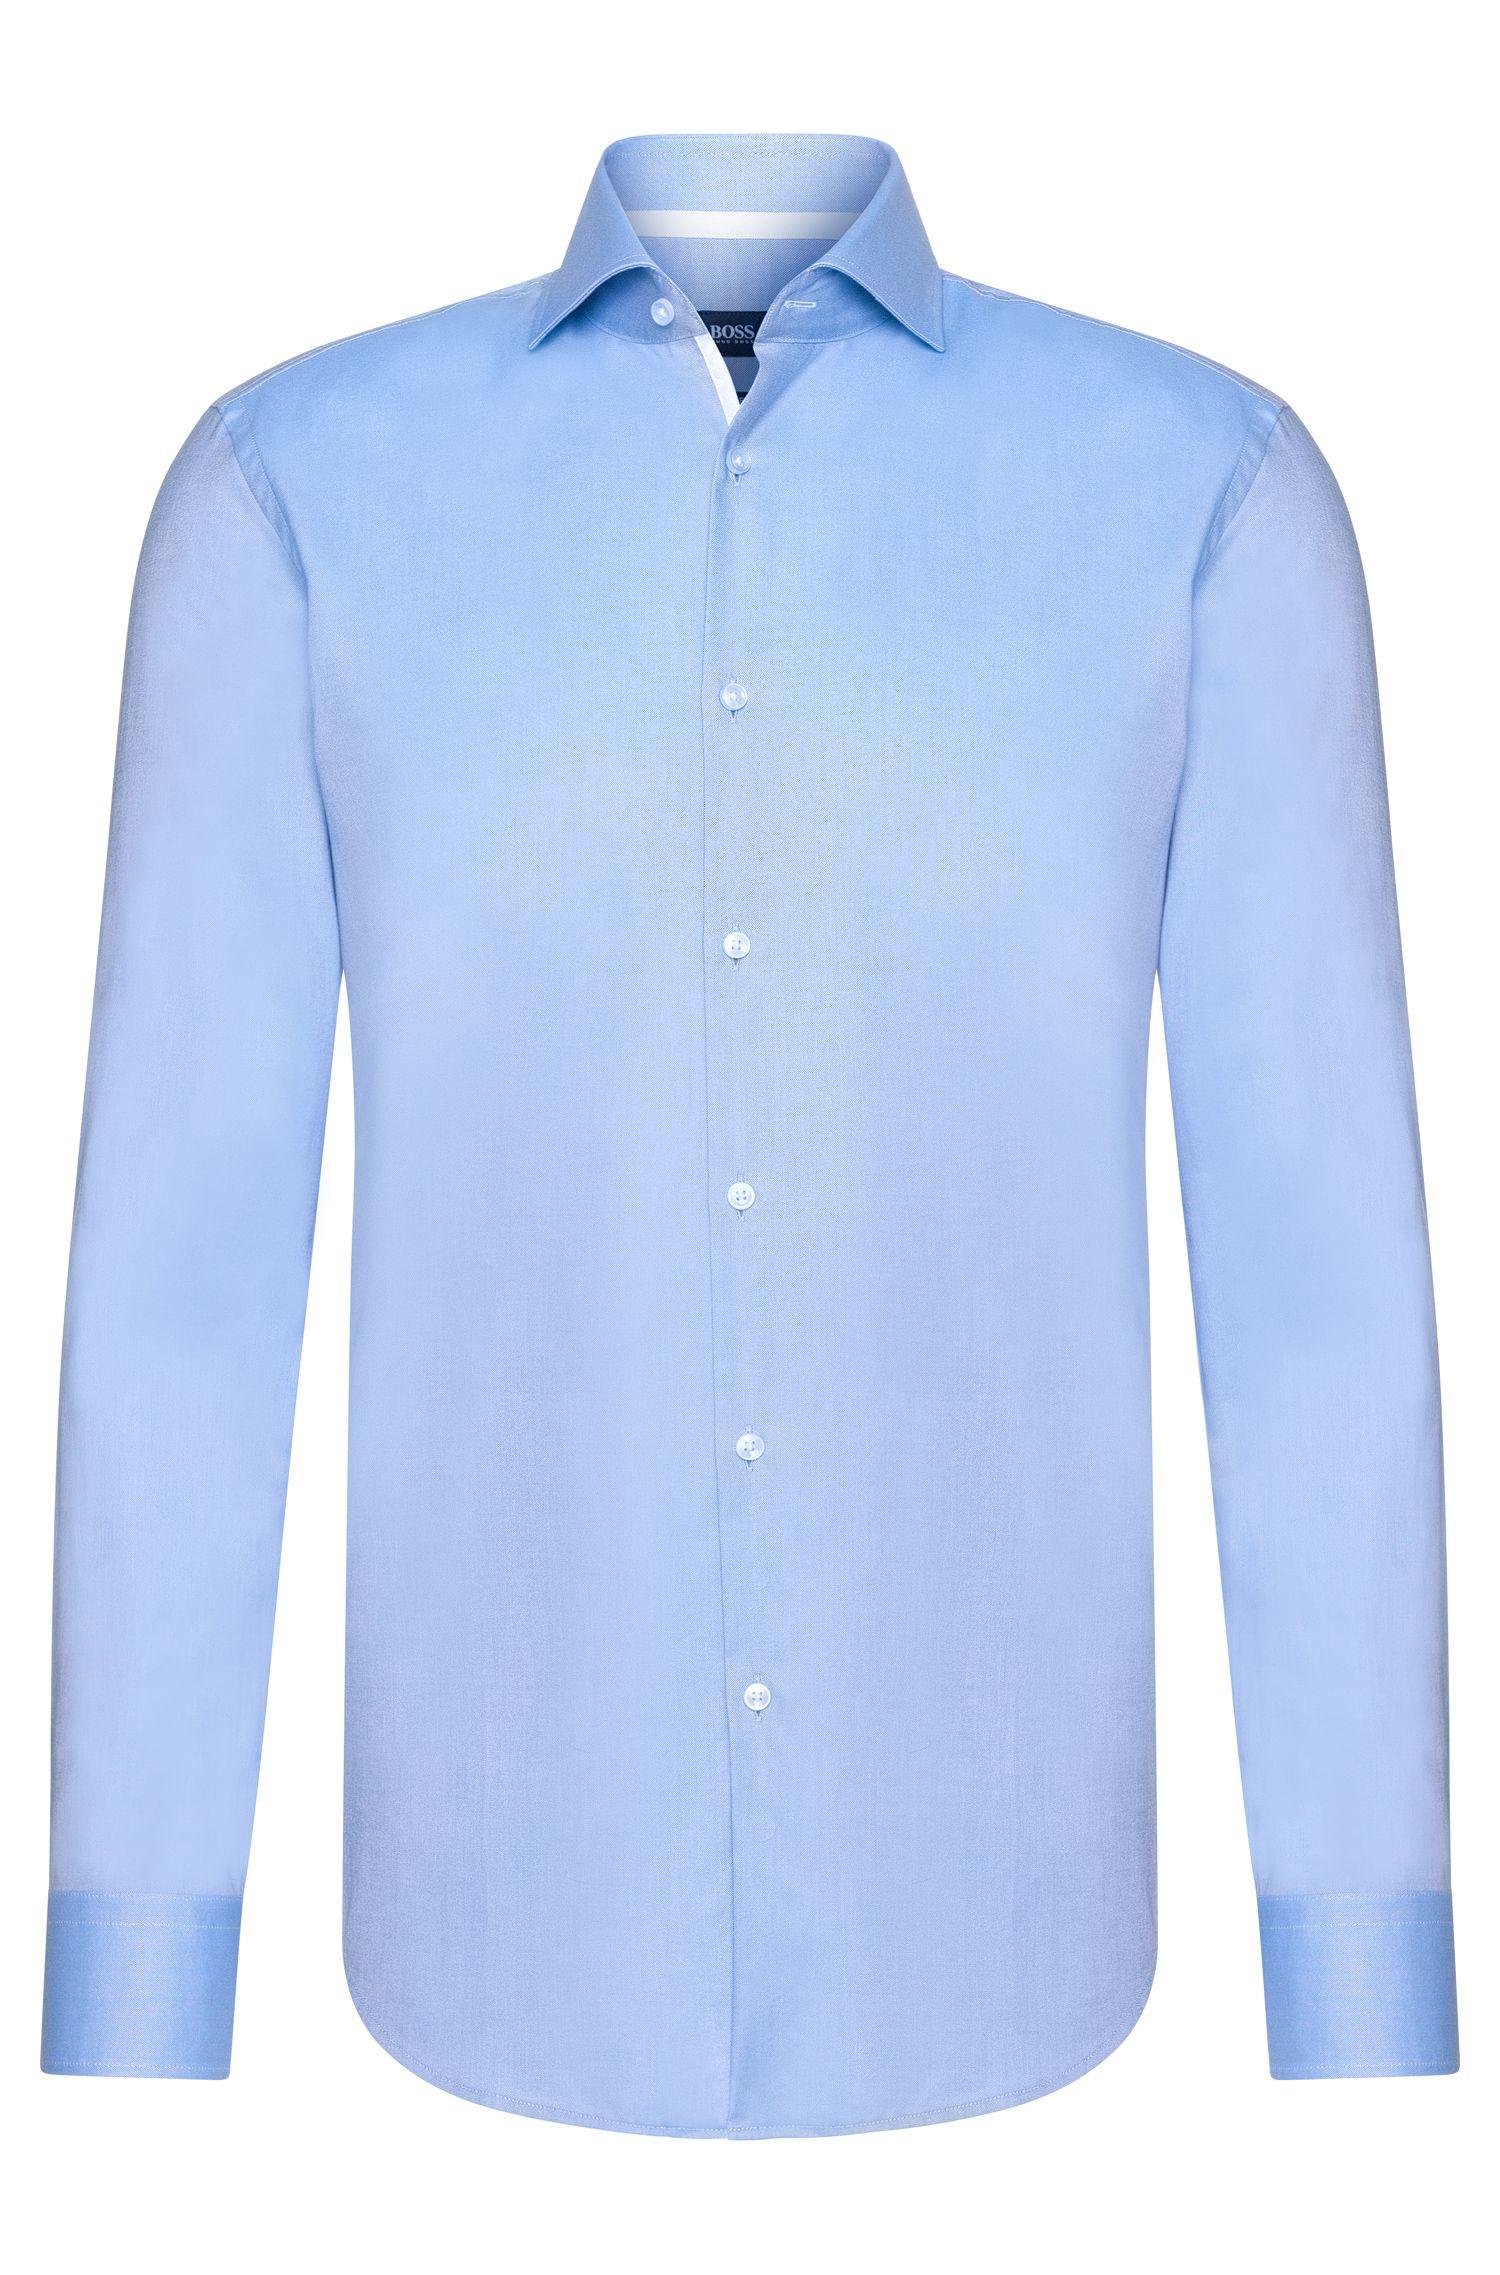 Contrast Cotton Dress Shirt, Slim Fit | Jery